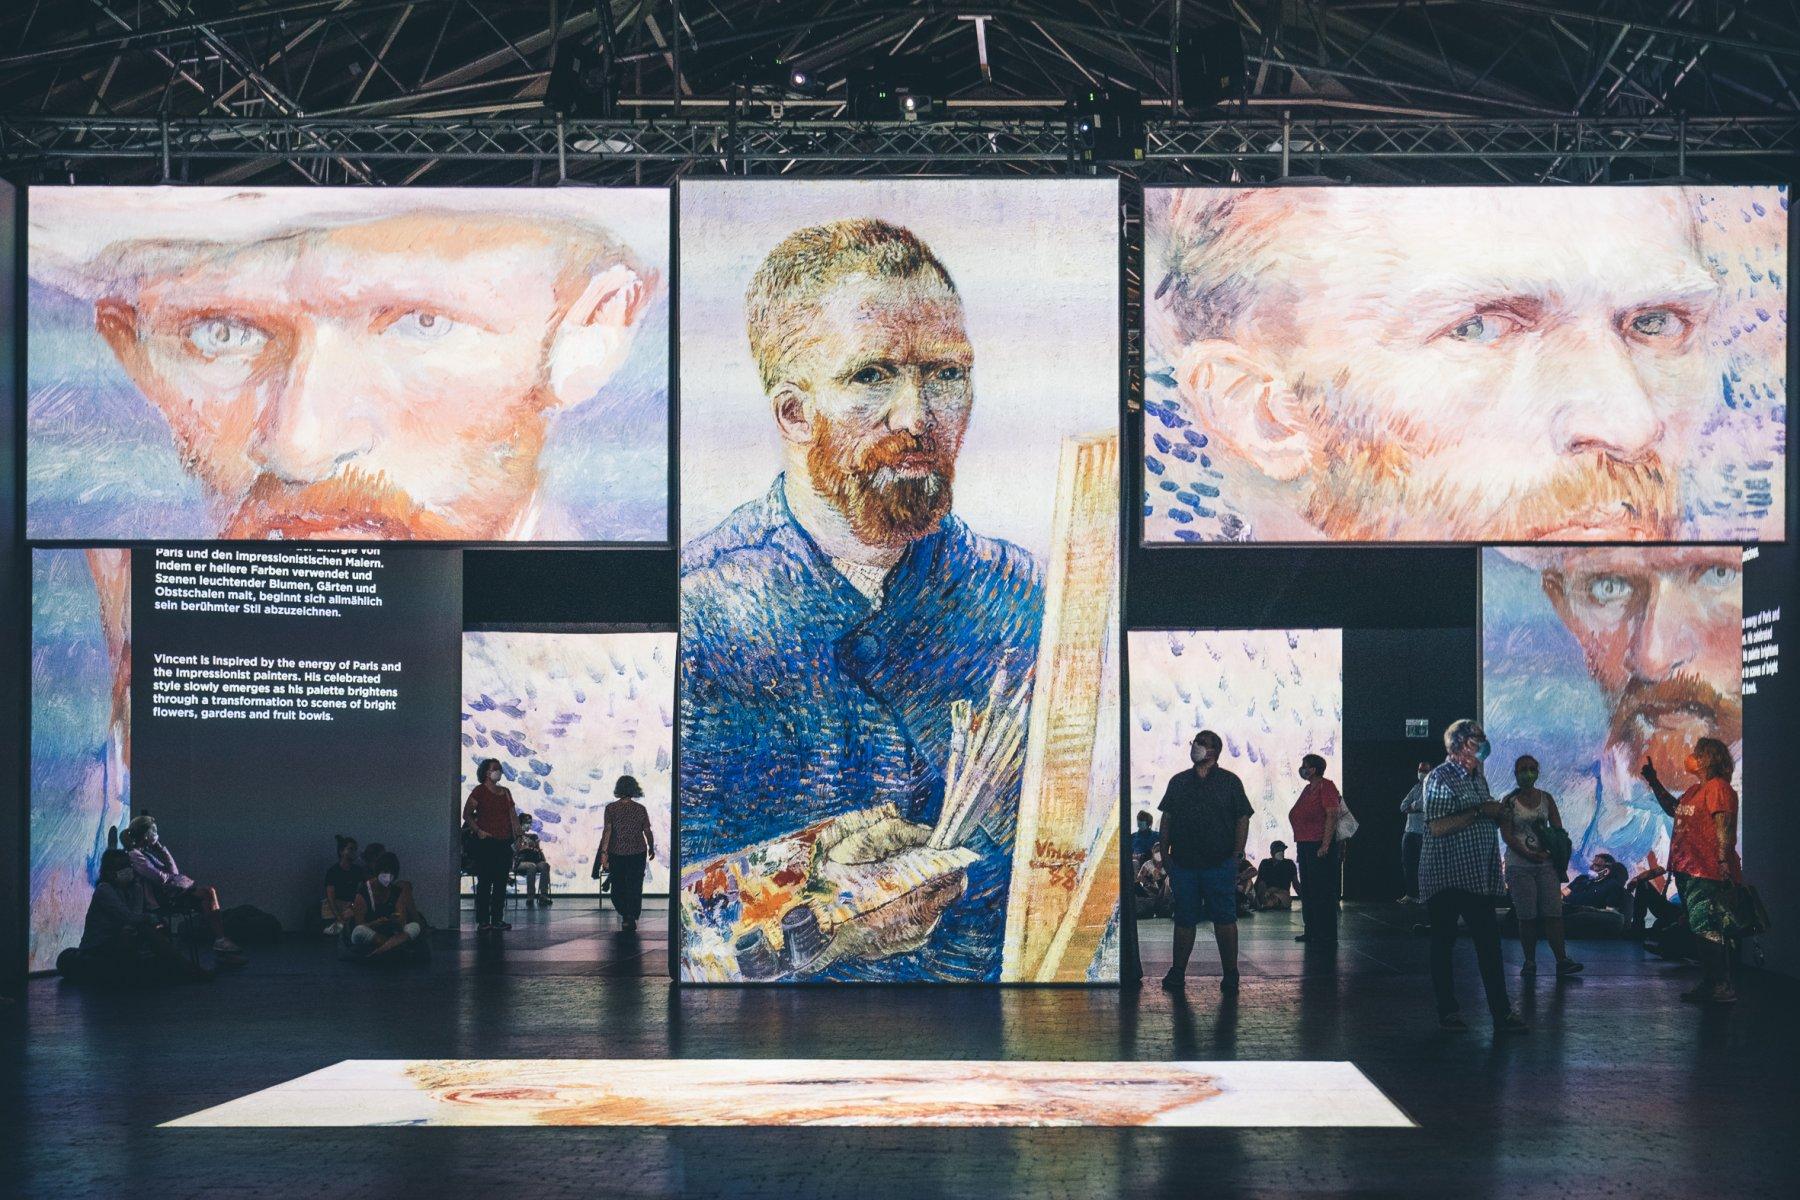 Van Gogh Alive 6189 – ©wunderland media GmbH